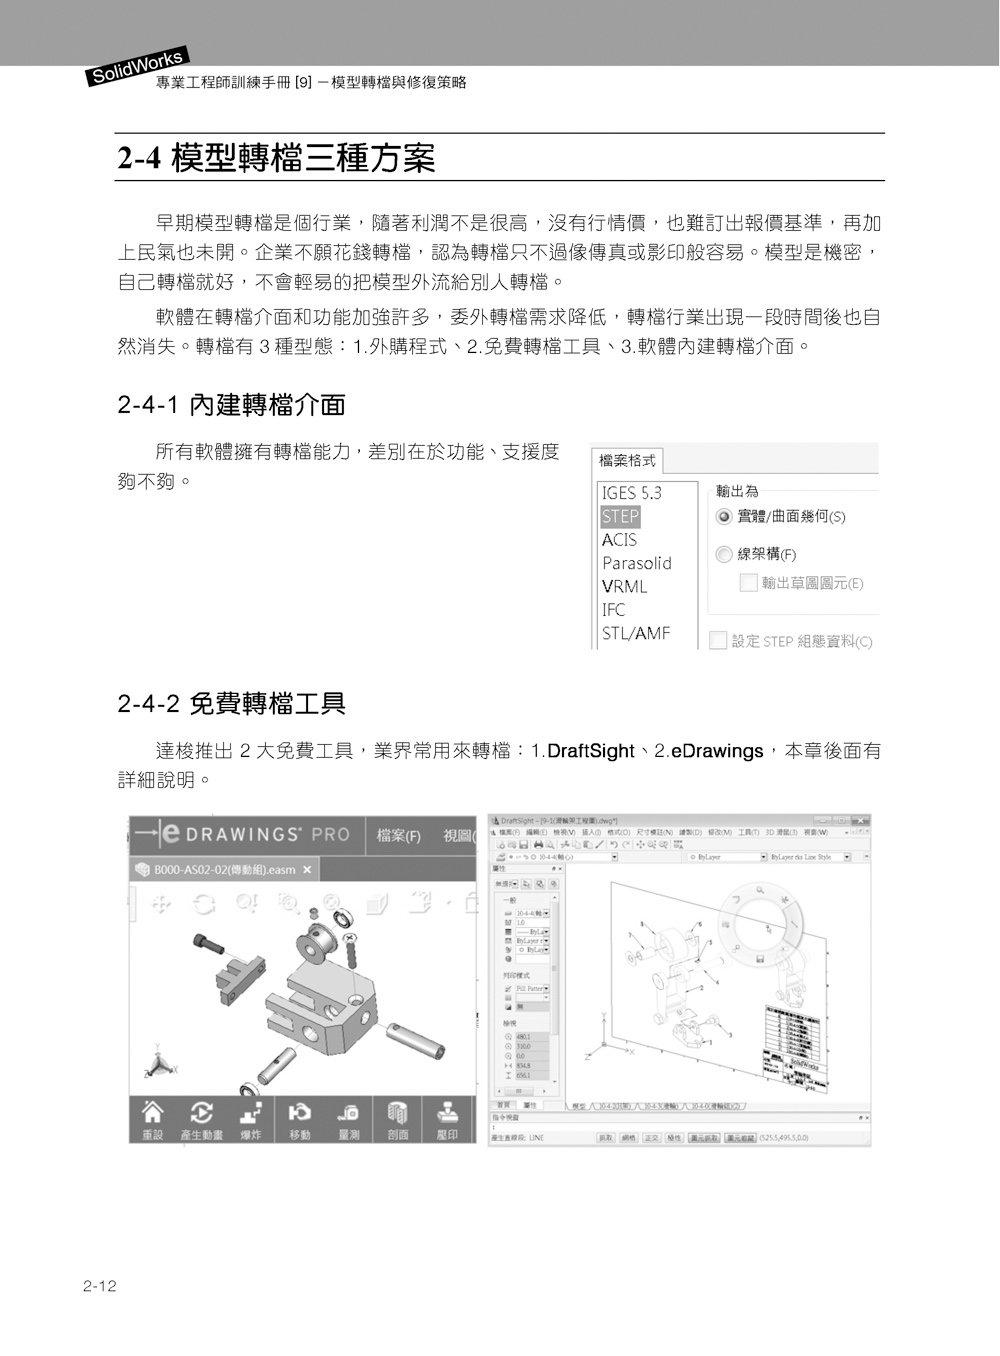 Solidworks 專業工程師訓練手冊[9]-模型轉檔與修復策略-preview-1